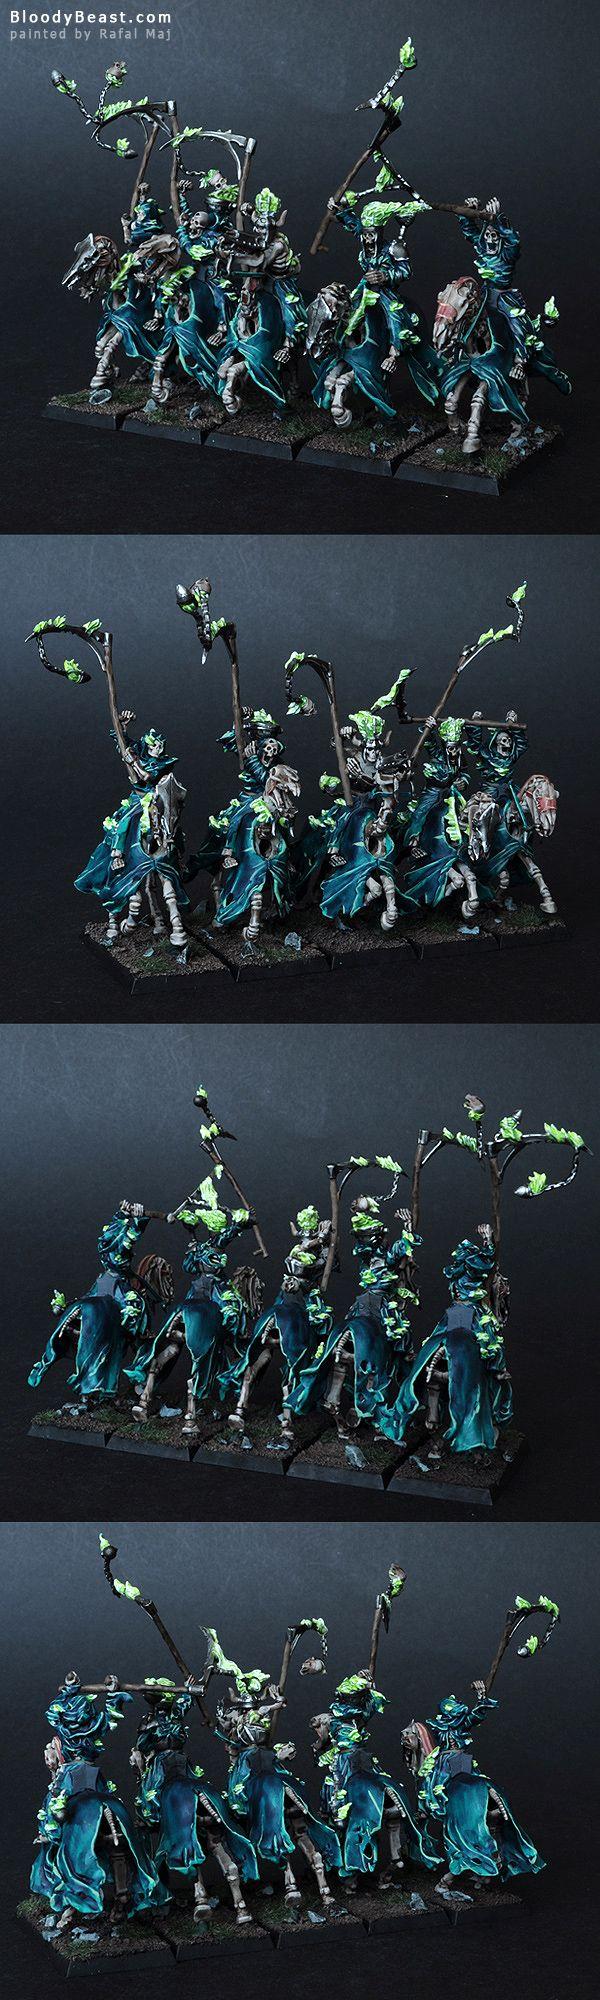 Vampire Counts Hexwraiths painted by Rafal Maj (BloodyBeast.com)